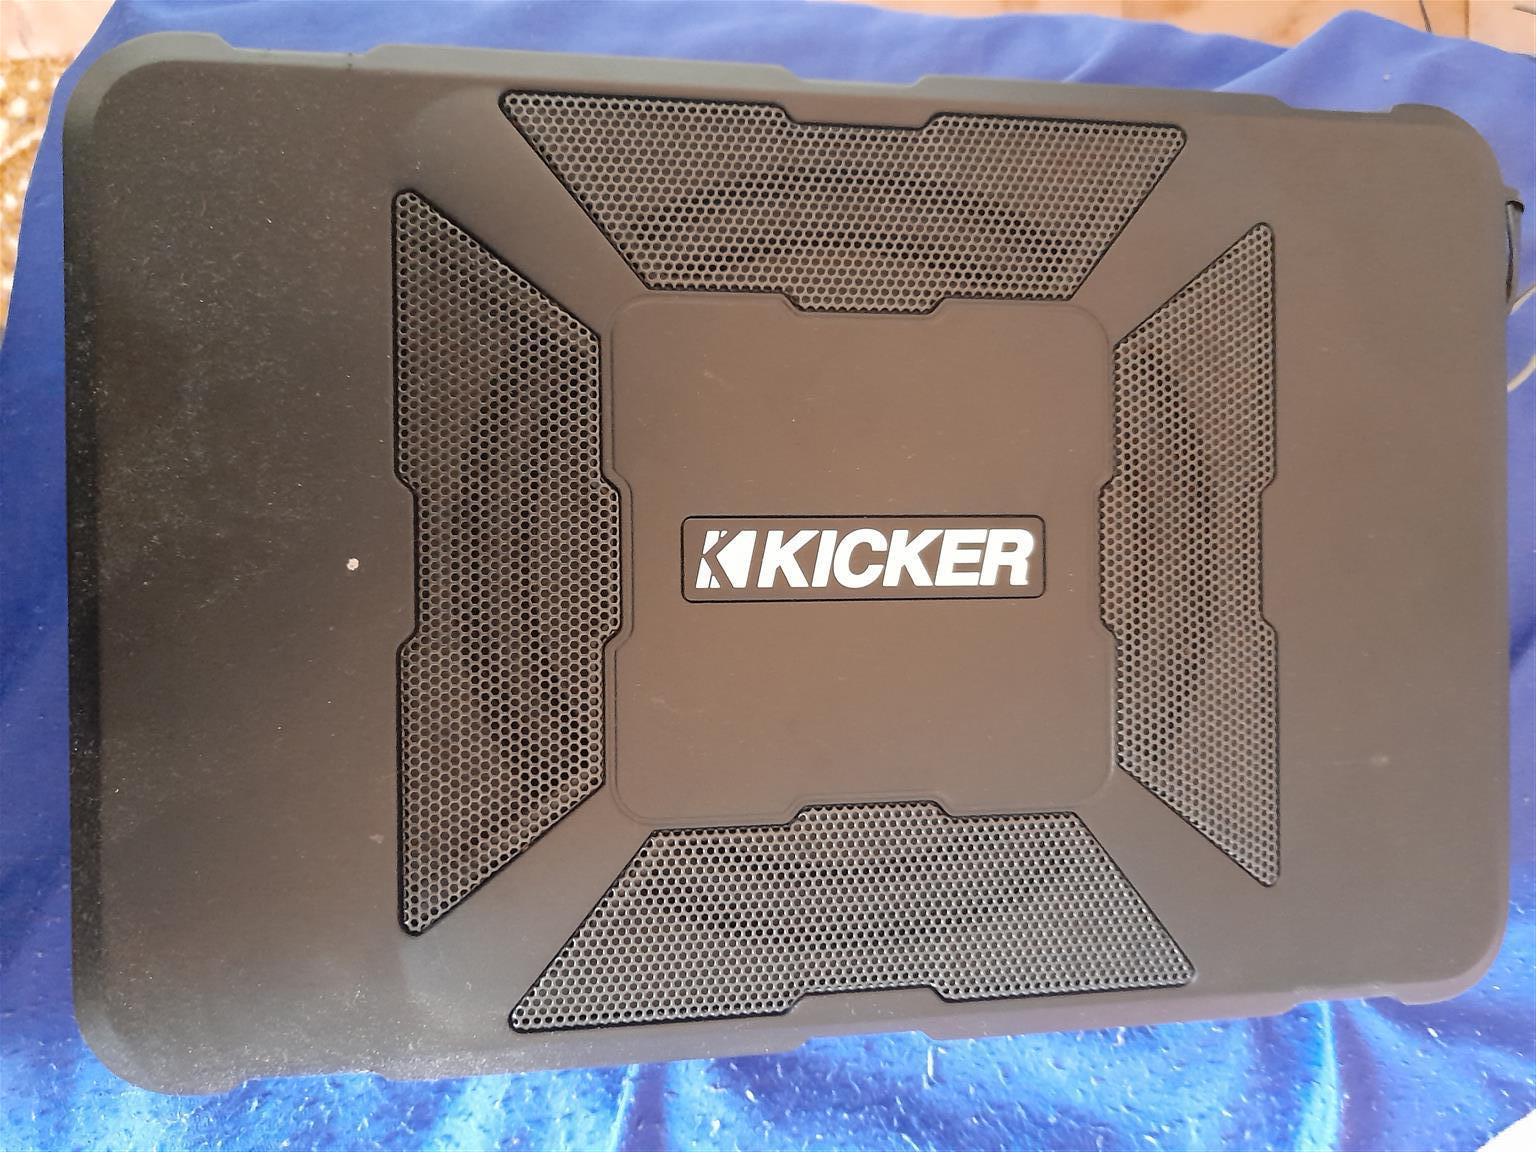 Kicker amp